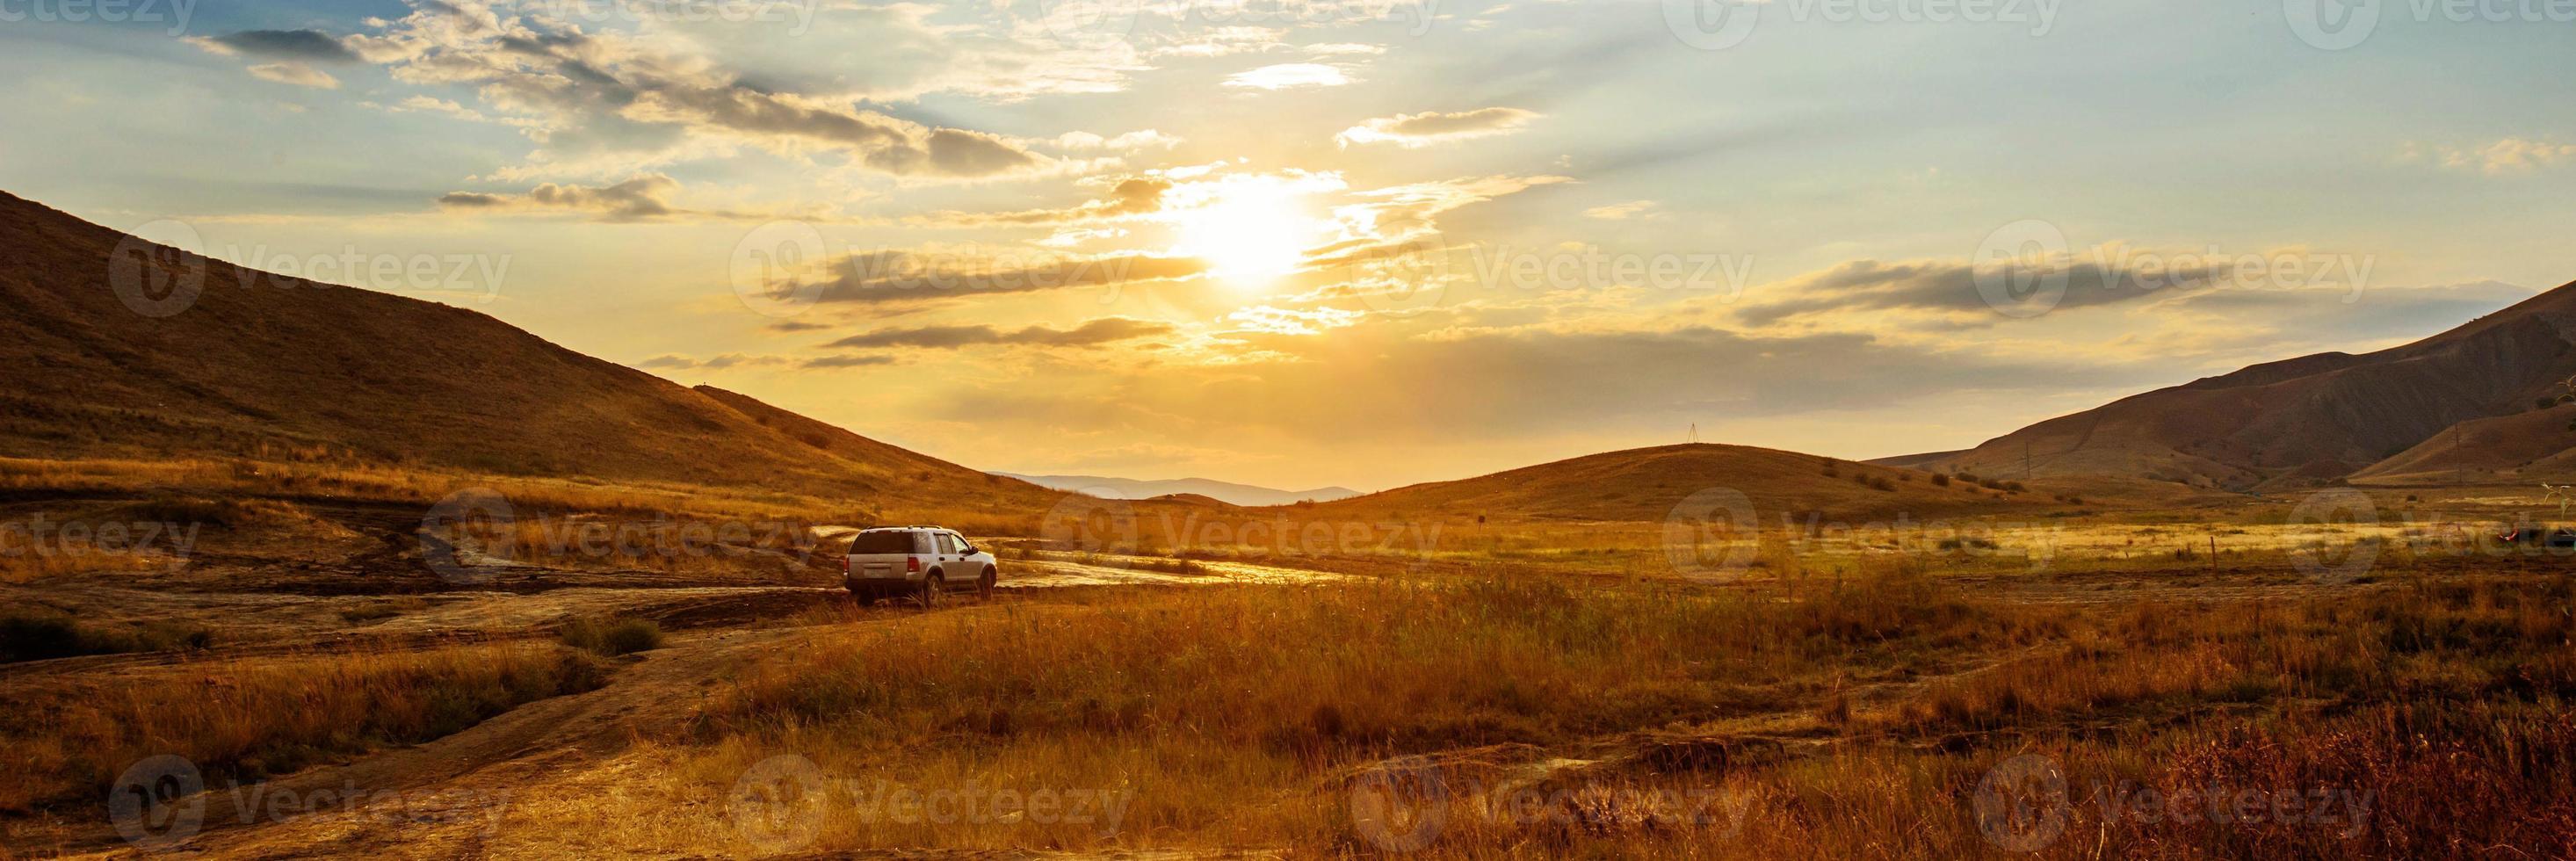 Auto bei Sonnenuntergang foto